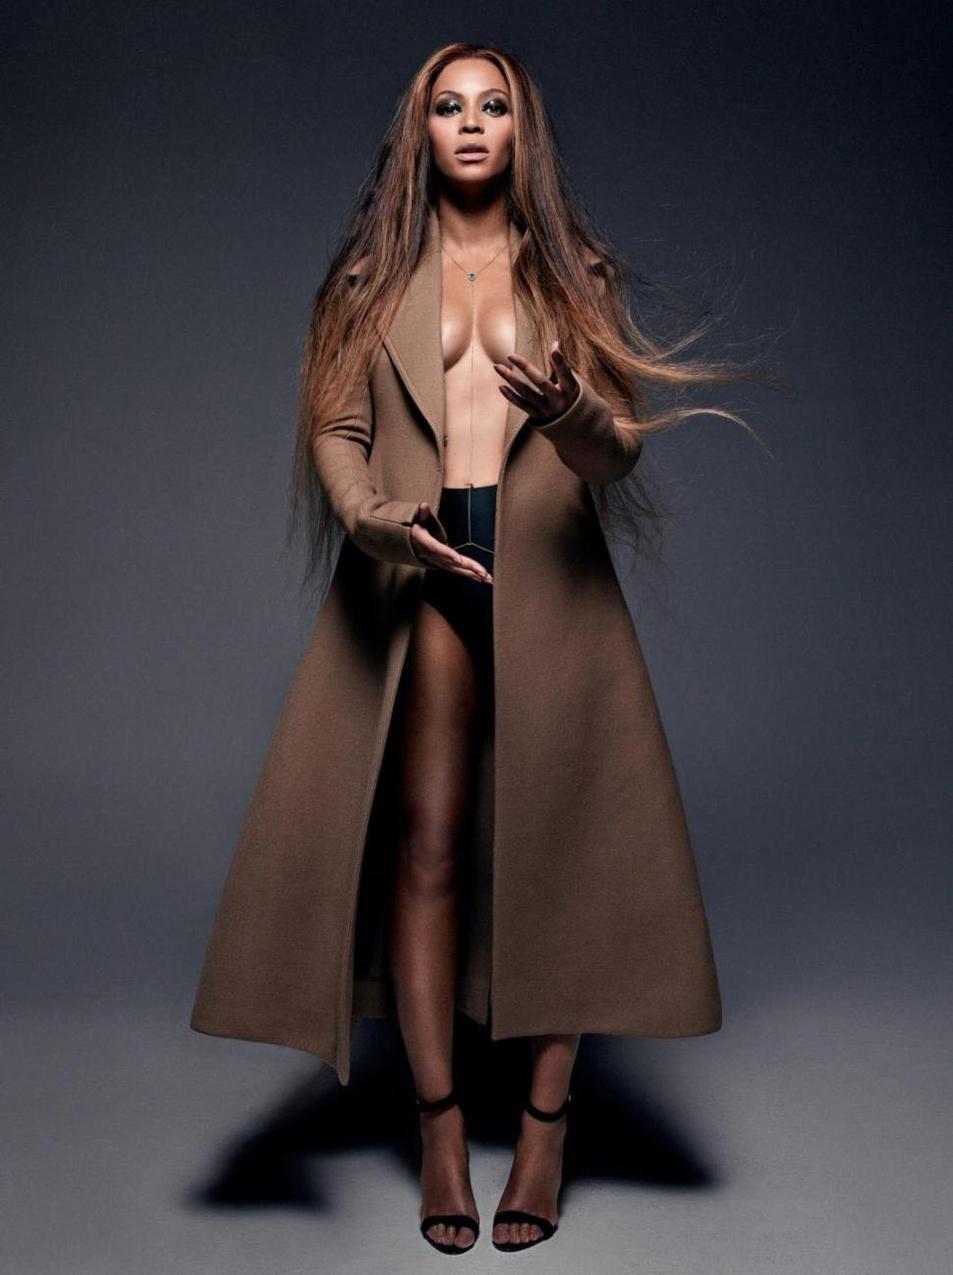 Pierre Debusschere / CR Fashion Book